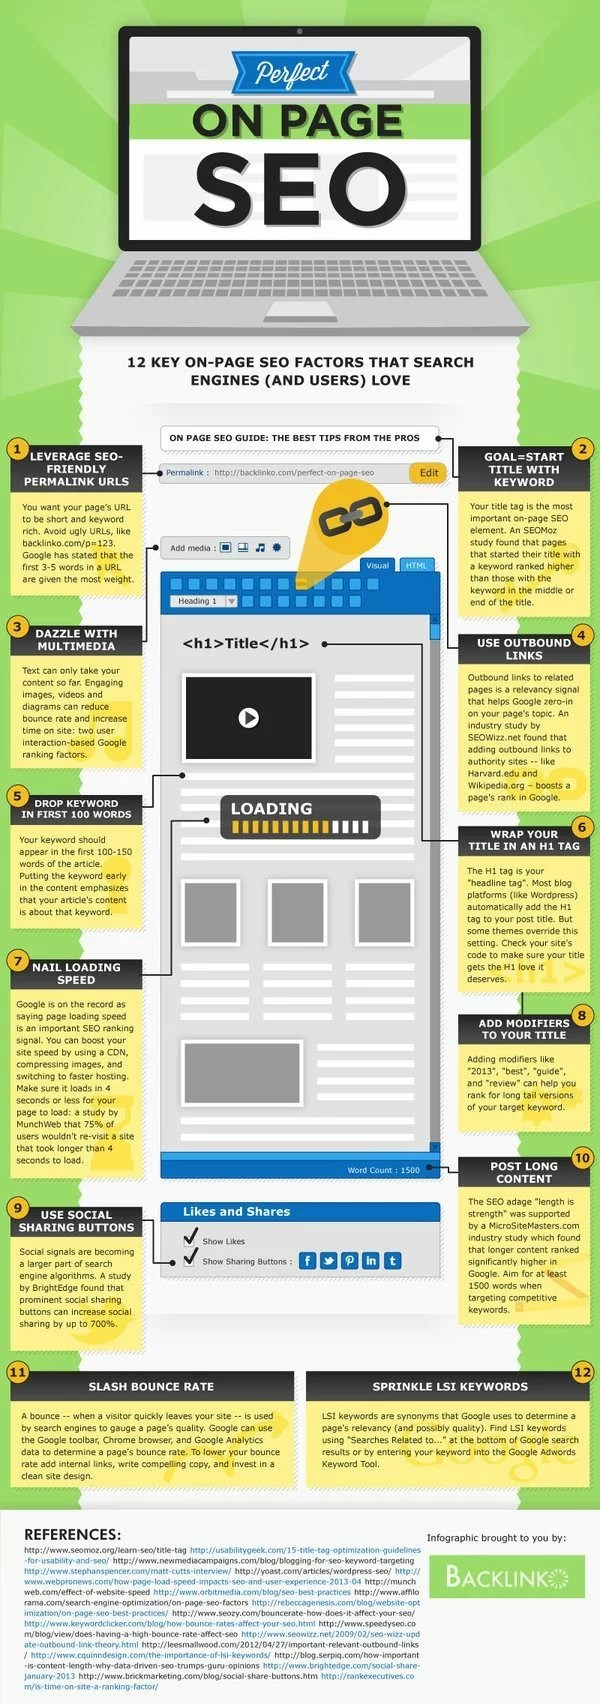 Backlinko on page seo infographic